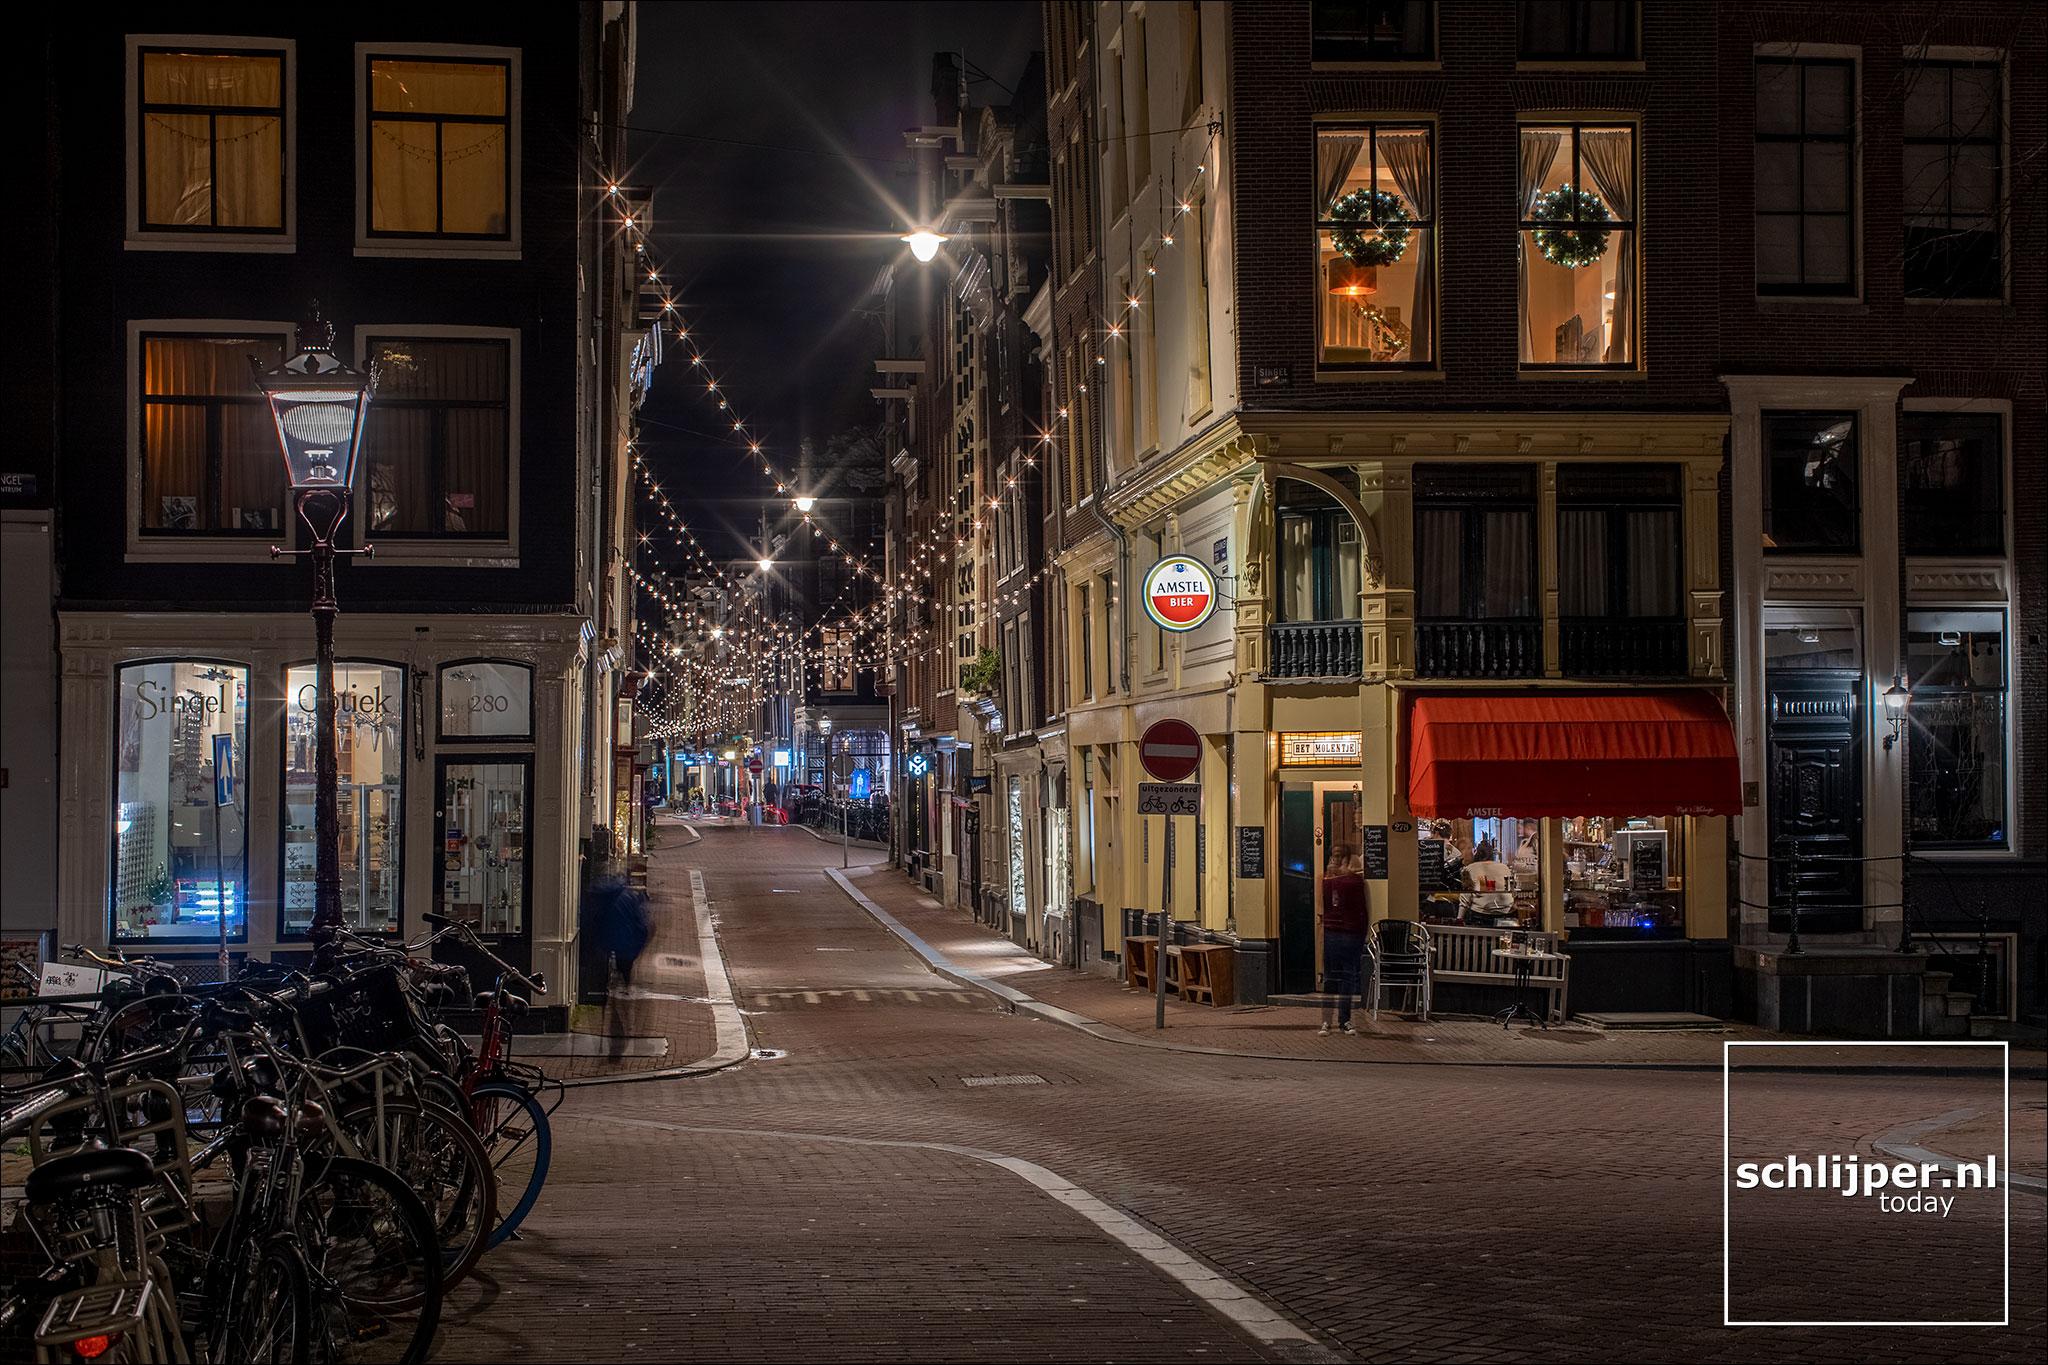 Nederland, Amsterdam, 20 december 2019